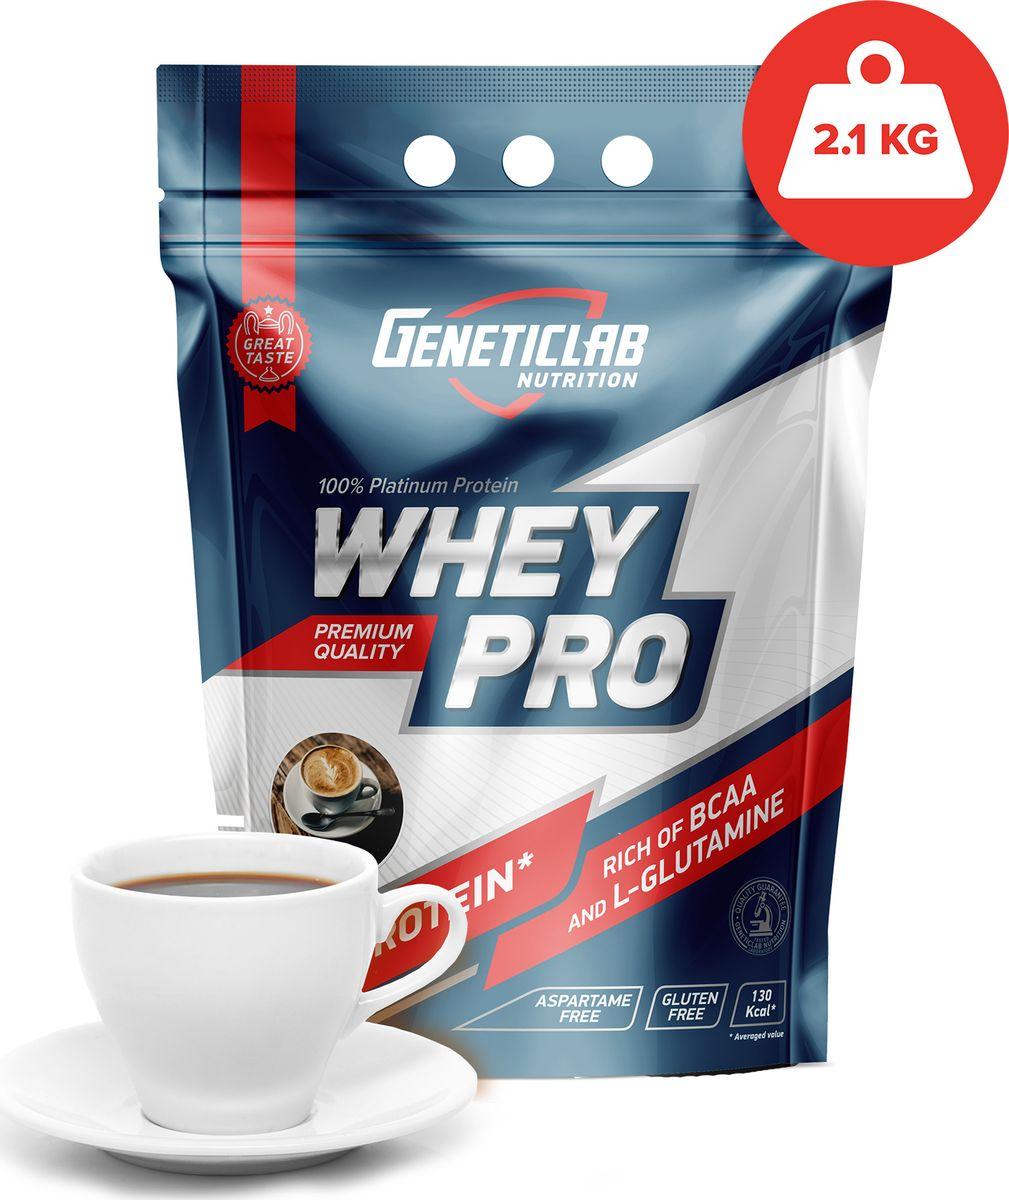 Протеин сывороточный Geneticlab Nutrition Whey Pro, кофе, 2,1 кг Geneticlab Nutrition